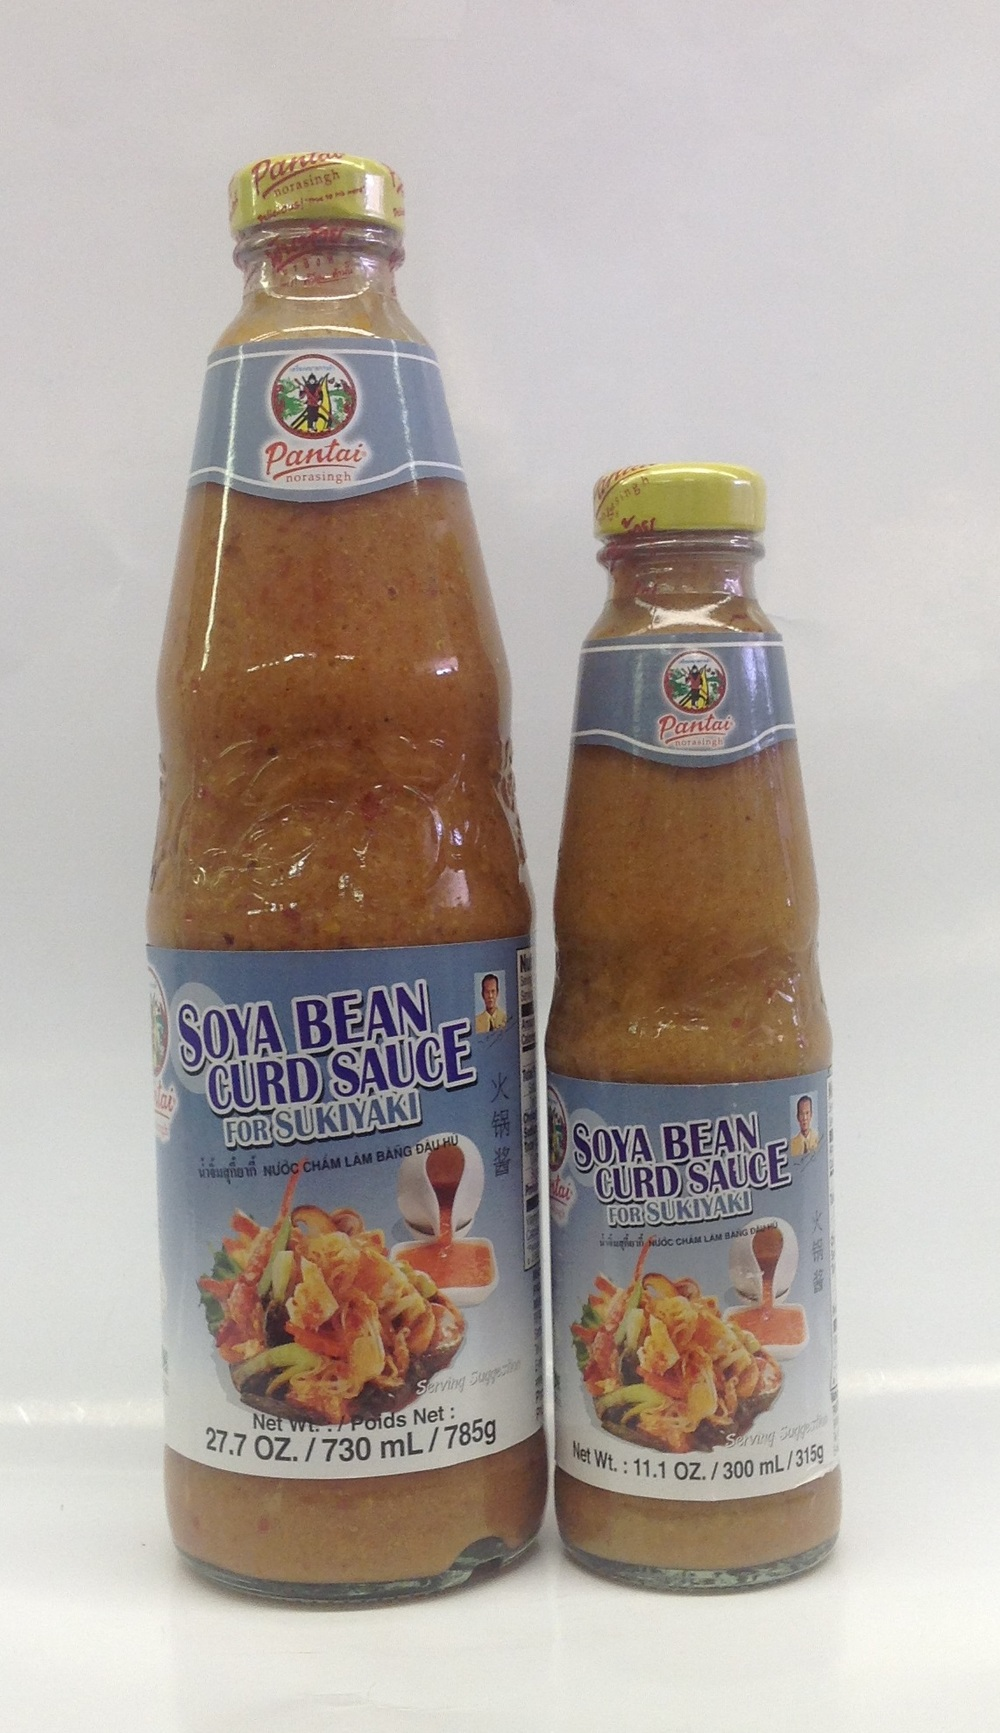 Soya Bean Curd Sauce for Sukiyaki   Pantai   SA17179 12x28 oz